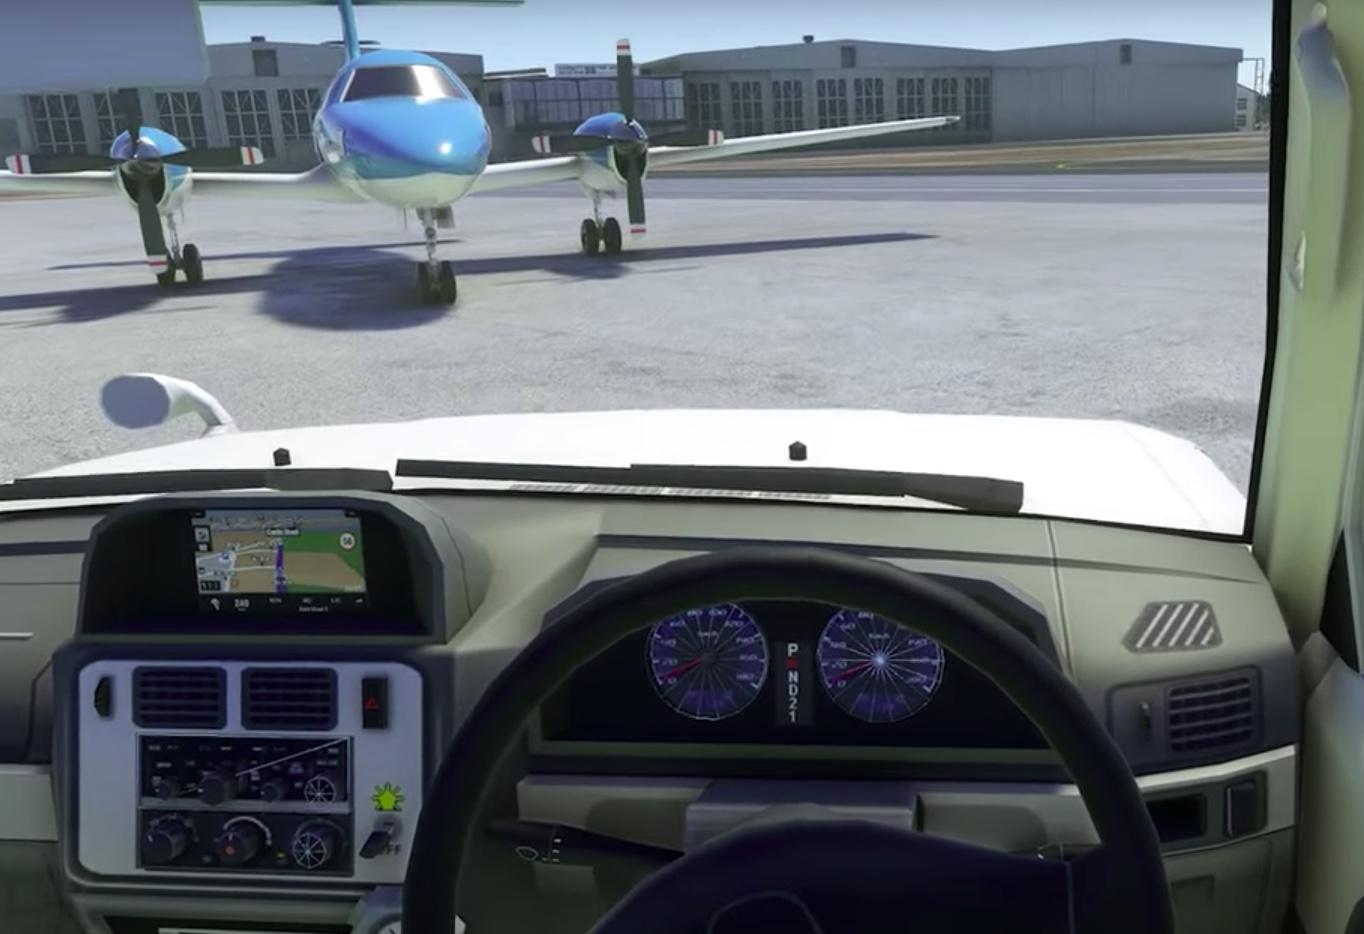 Perchè su Flight Simulator 2000 c'è anche una Mitsubishi ...